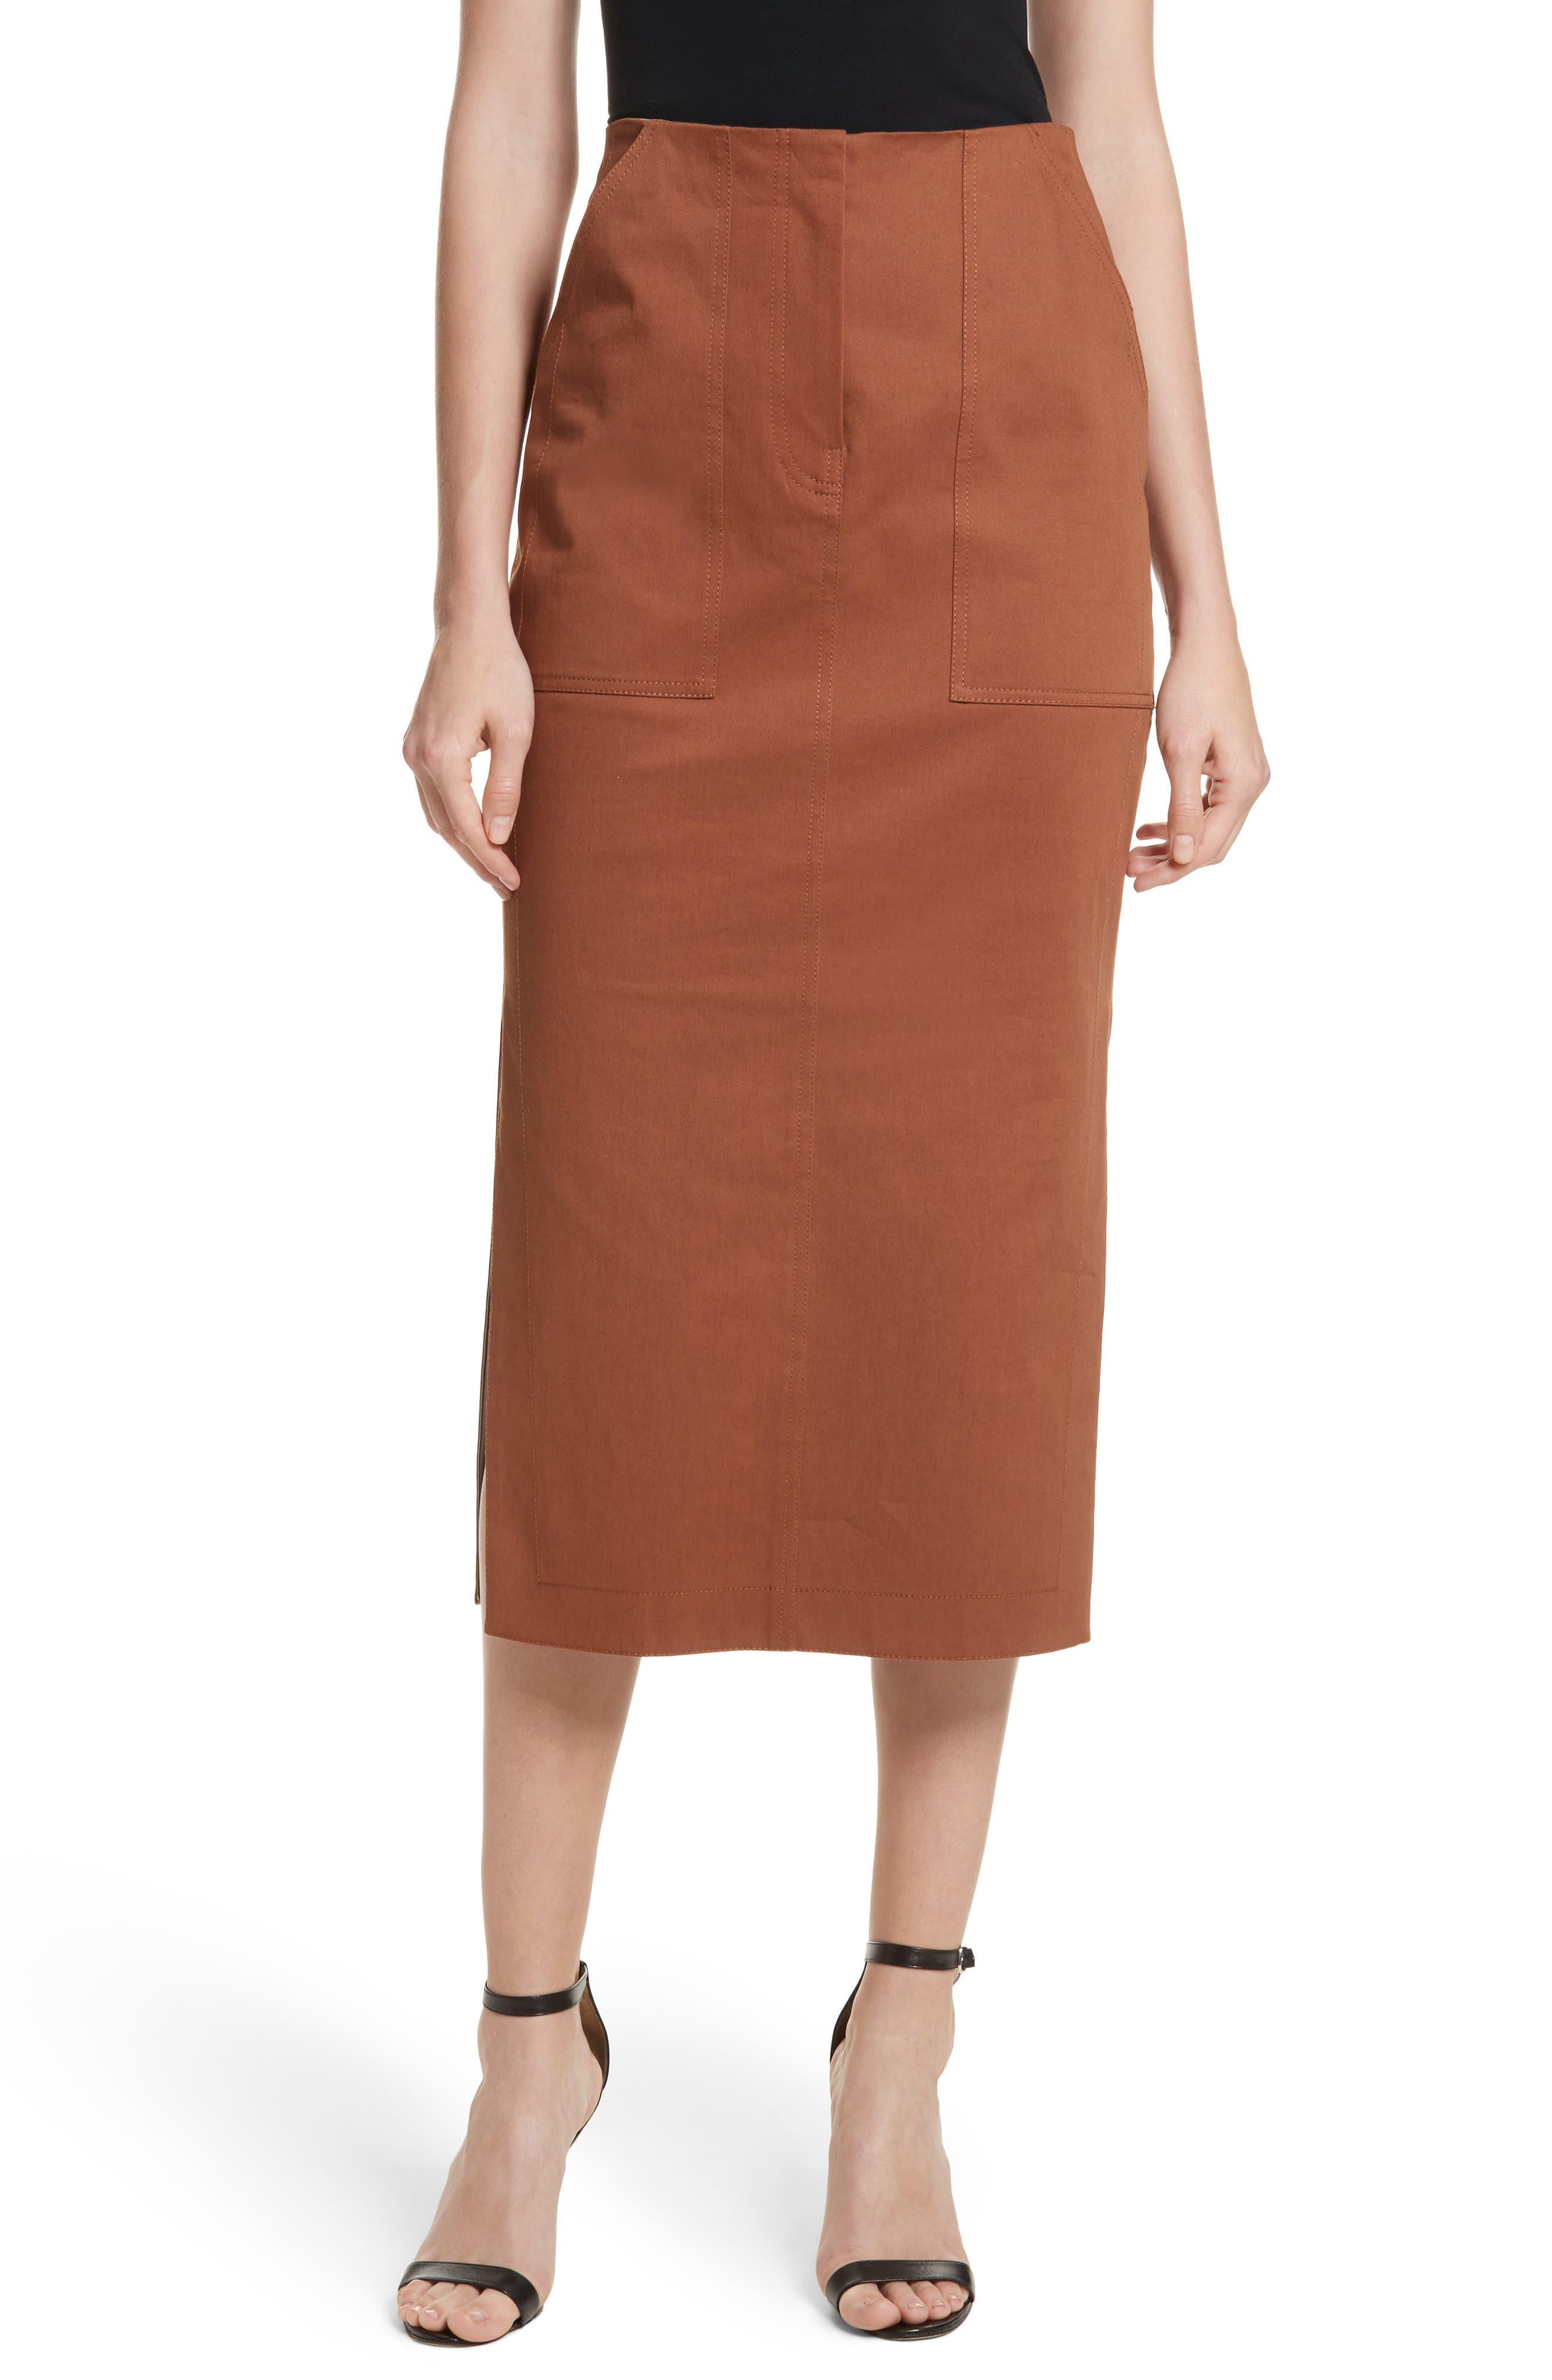 Diane von Furstenberg Midi Twill Pencil Skirt,                             Main thumbnail 1, color,                             203